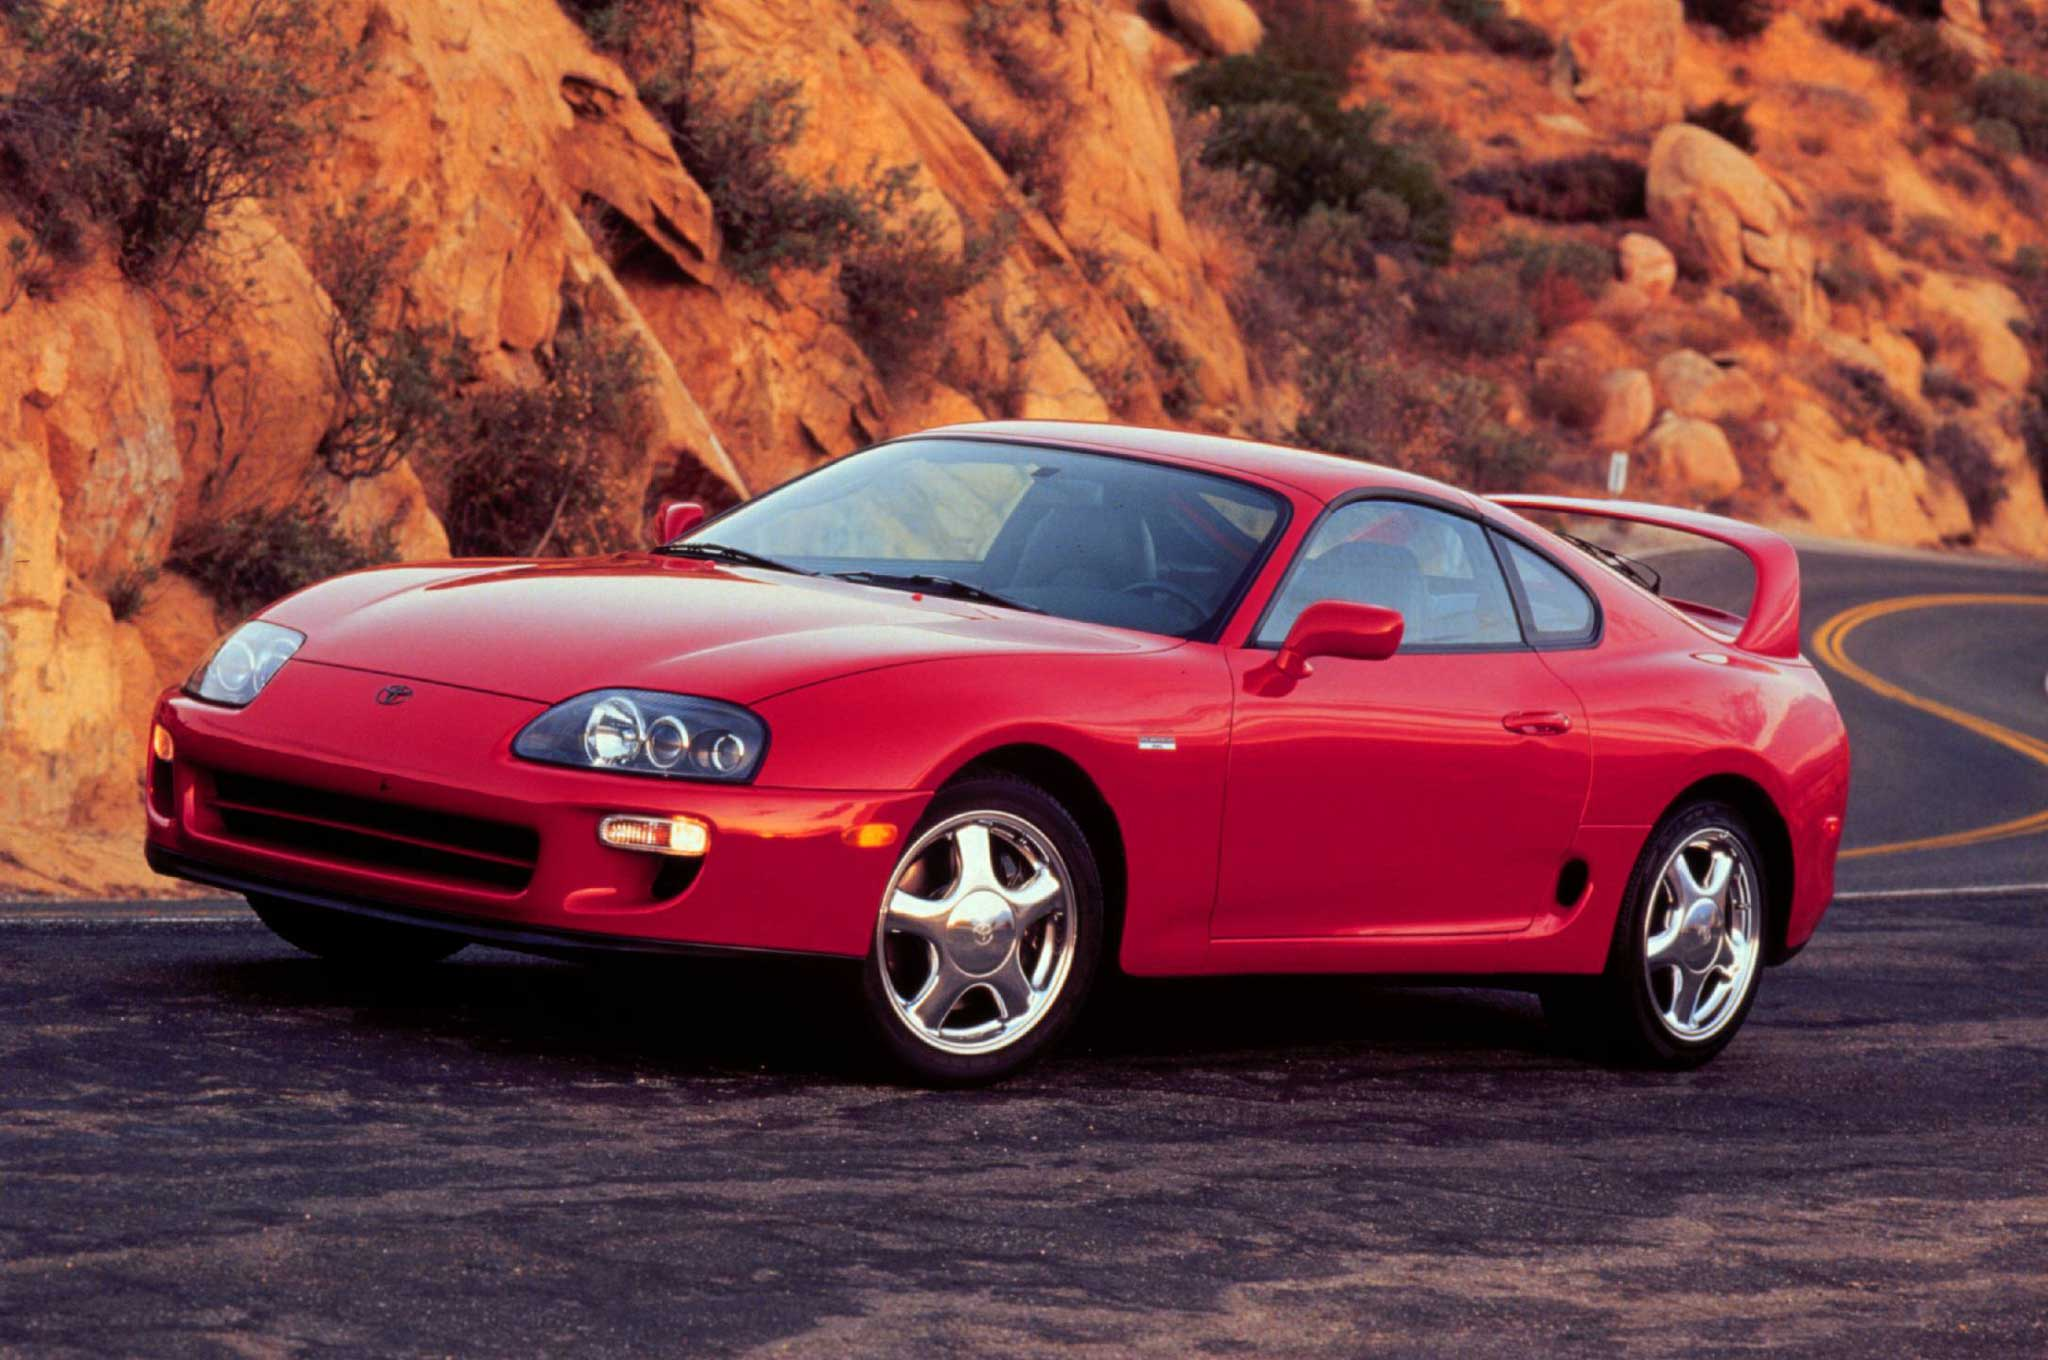 1997 Toyota Supra Turbo Front Three Quarter1